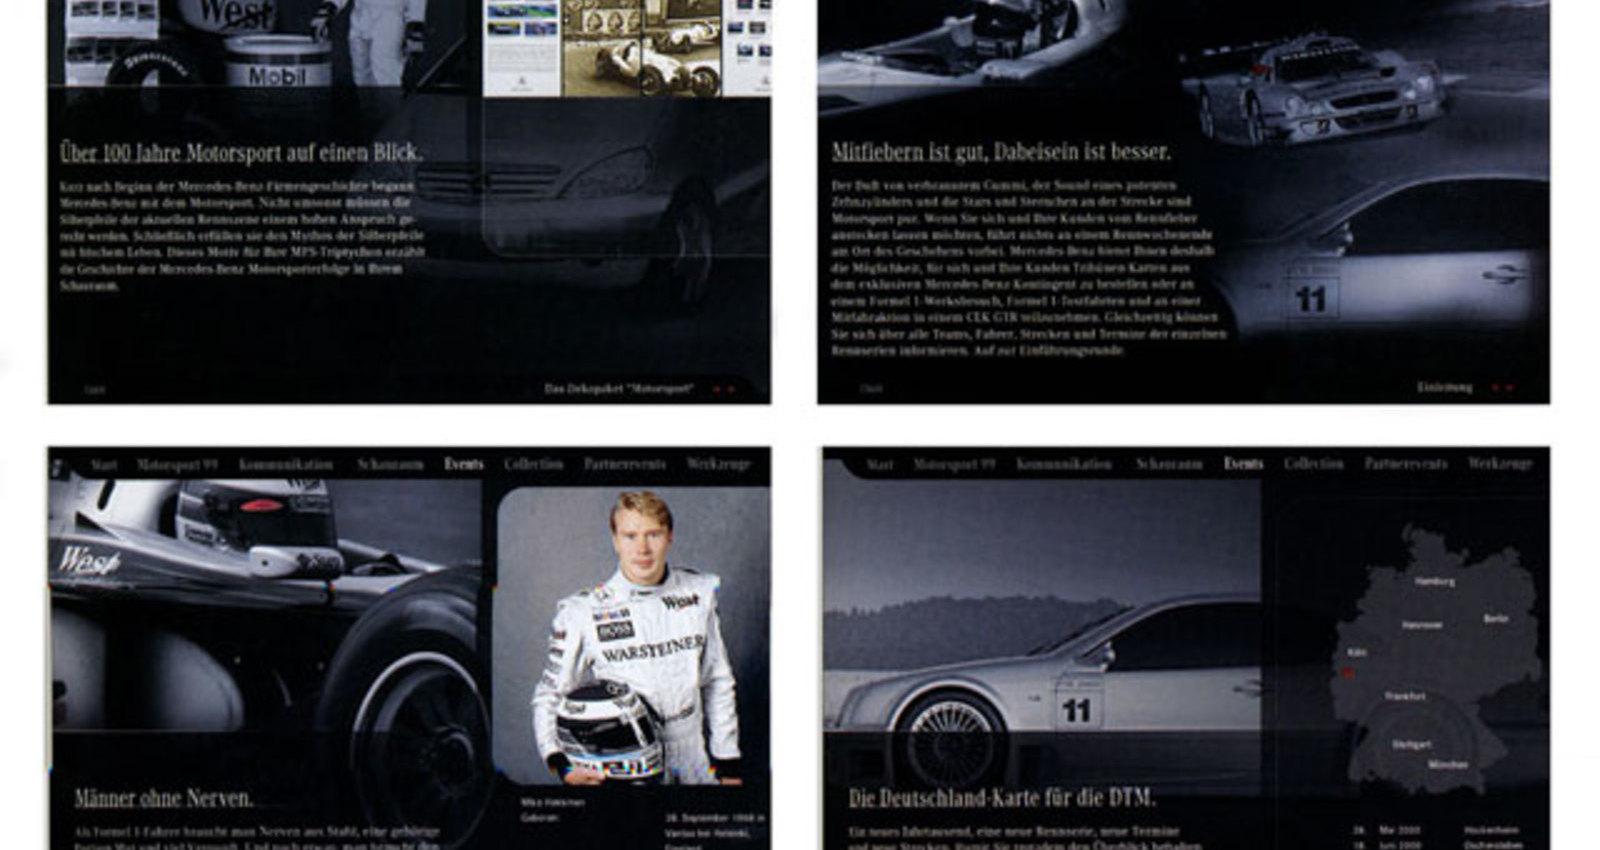 DaimlerChrysler Motorsport Martleitfaden